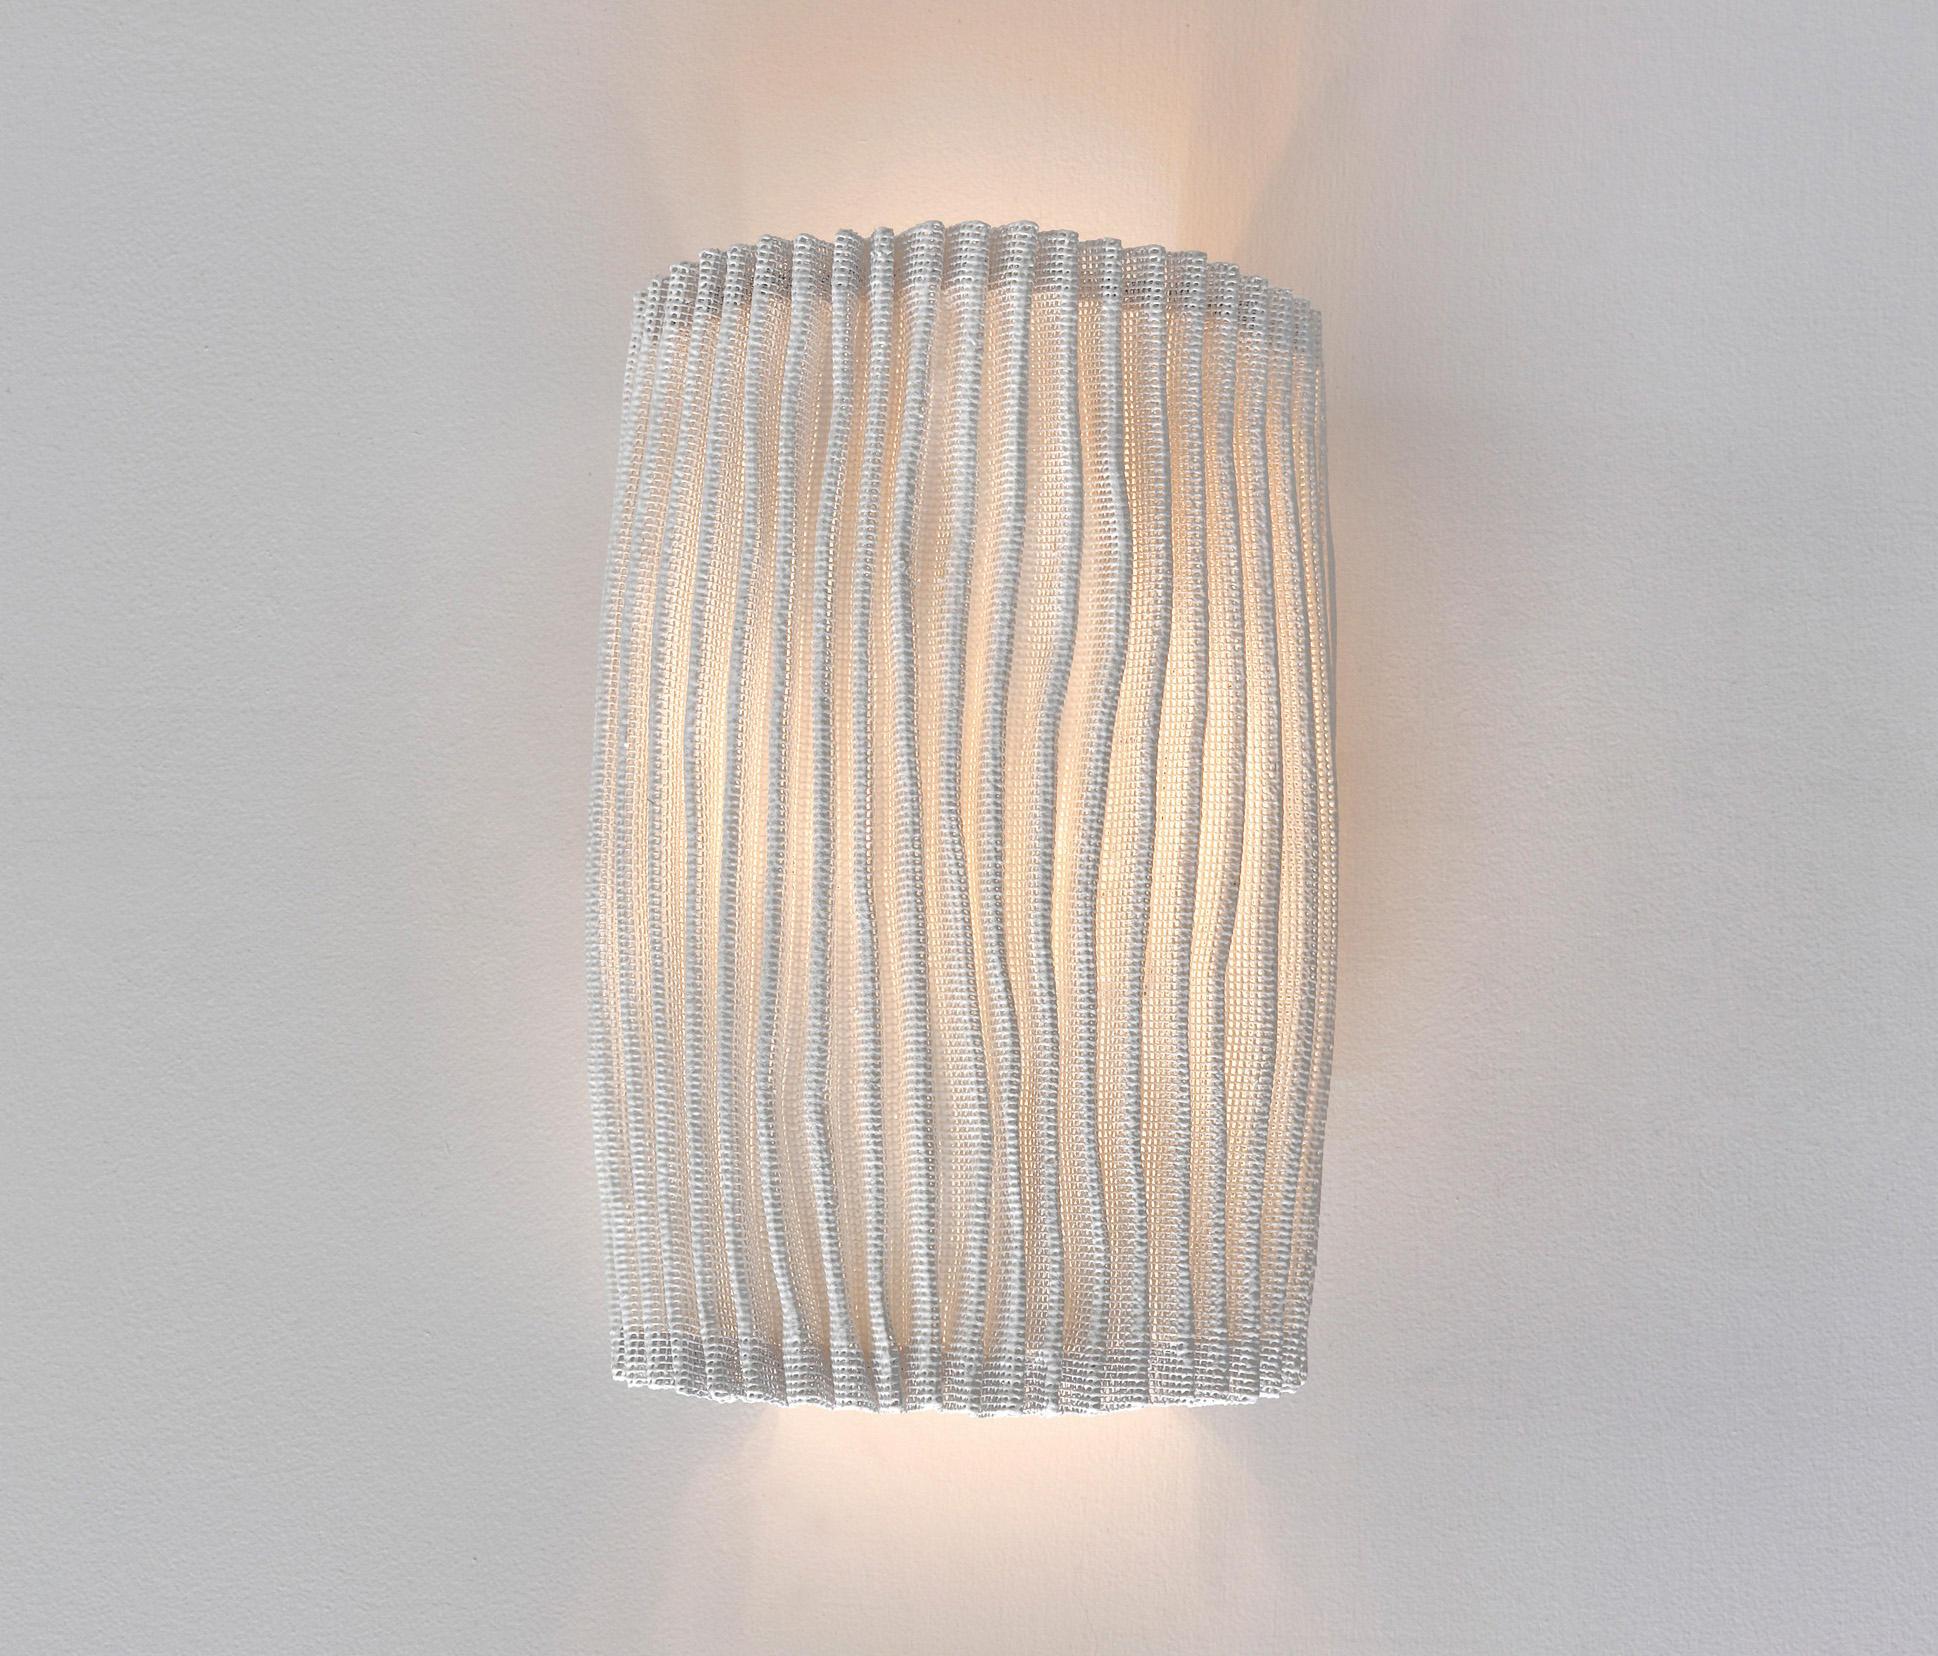 gea ge06 wall lights from arturo alvarez architonic